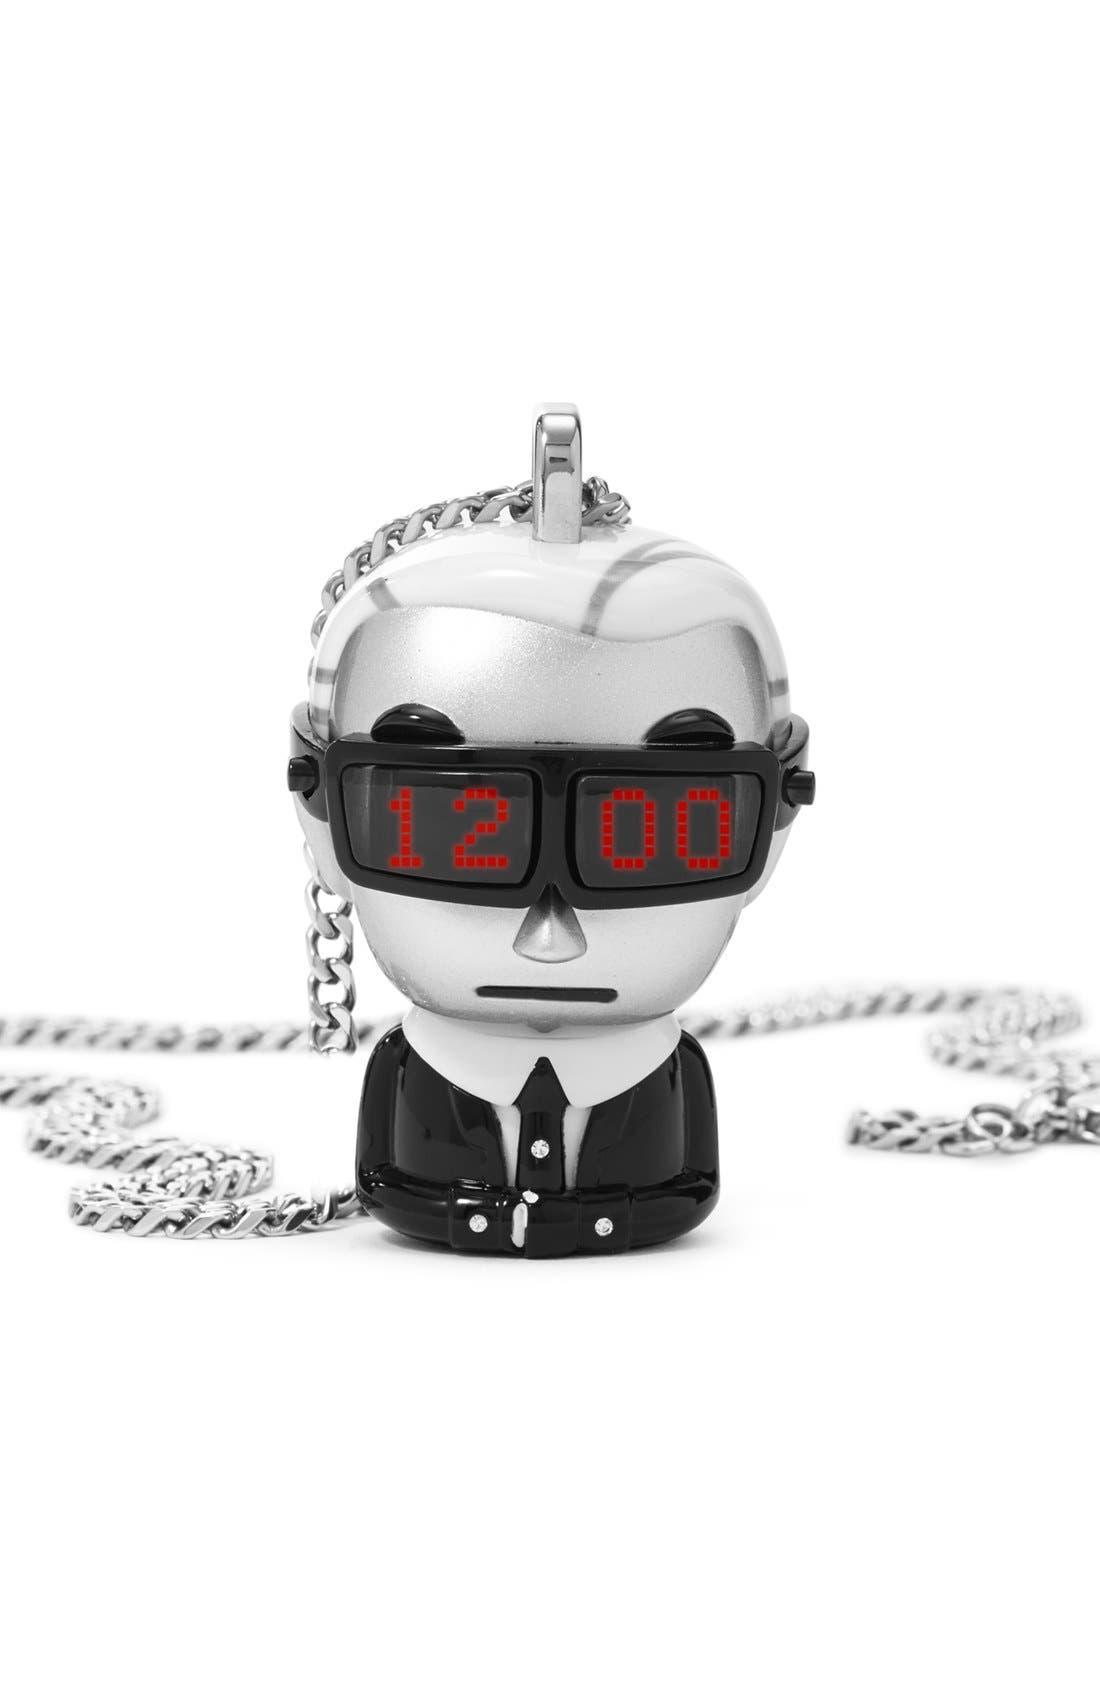 KARL LAGERFELD 'tokidoki' Digital Necklace Watch, 37mm x 51mm,                         Main,                         color, 040